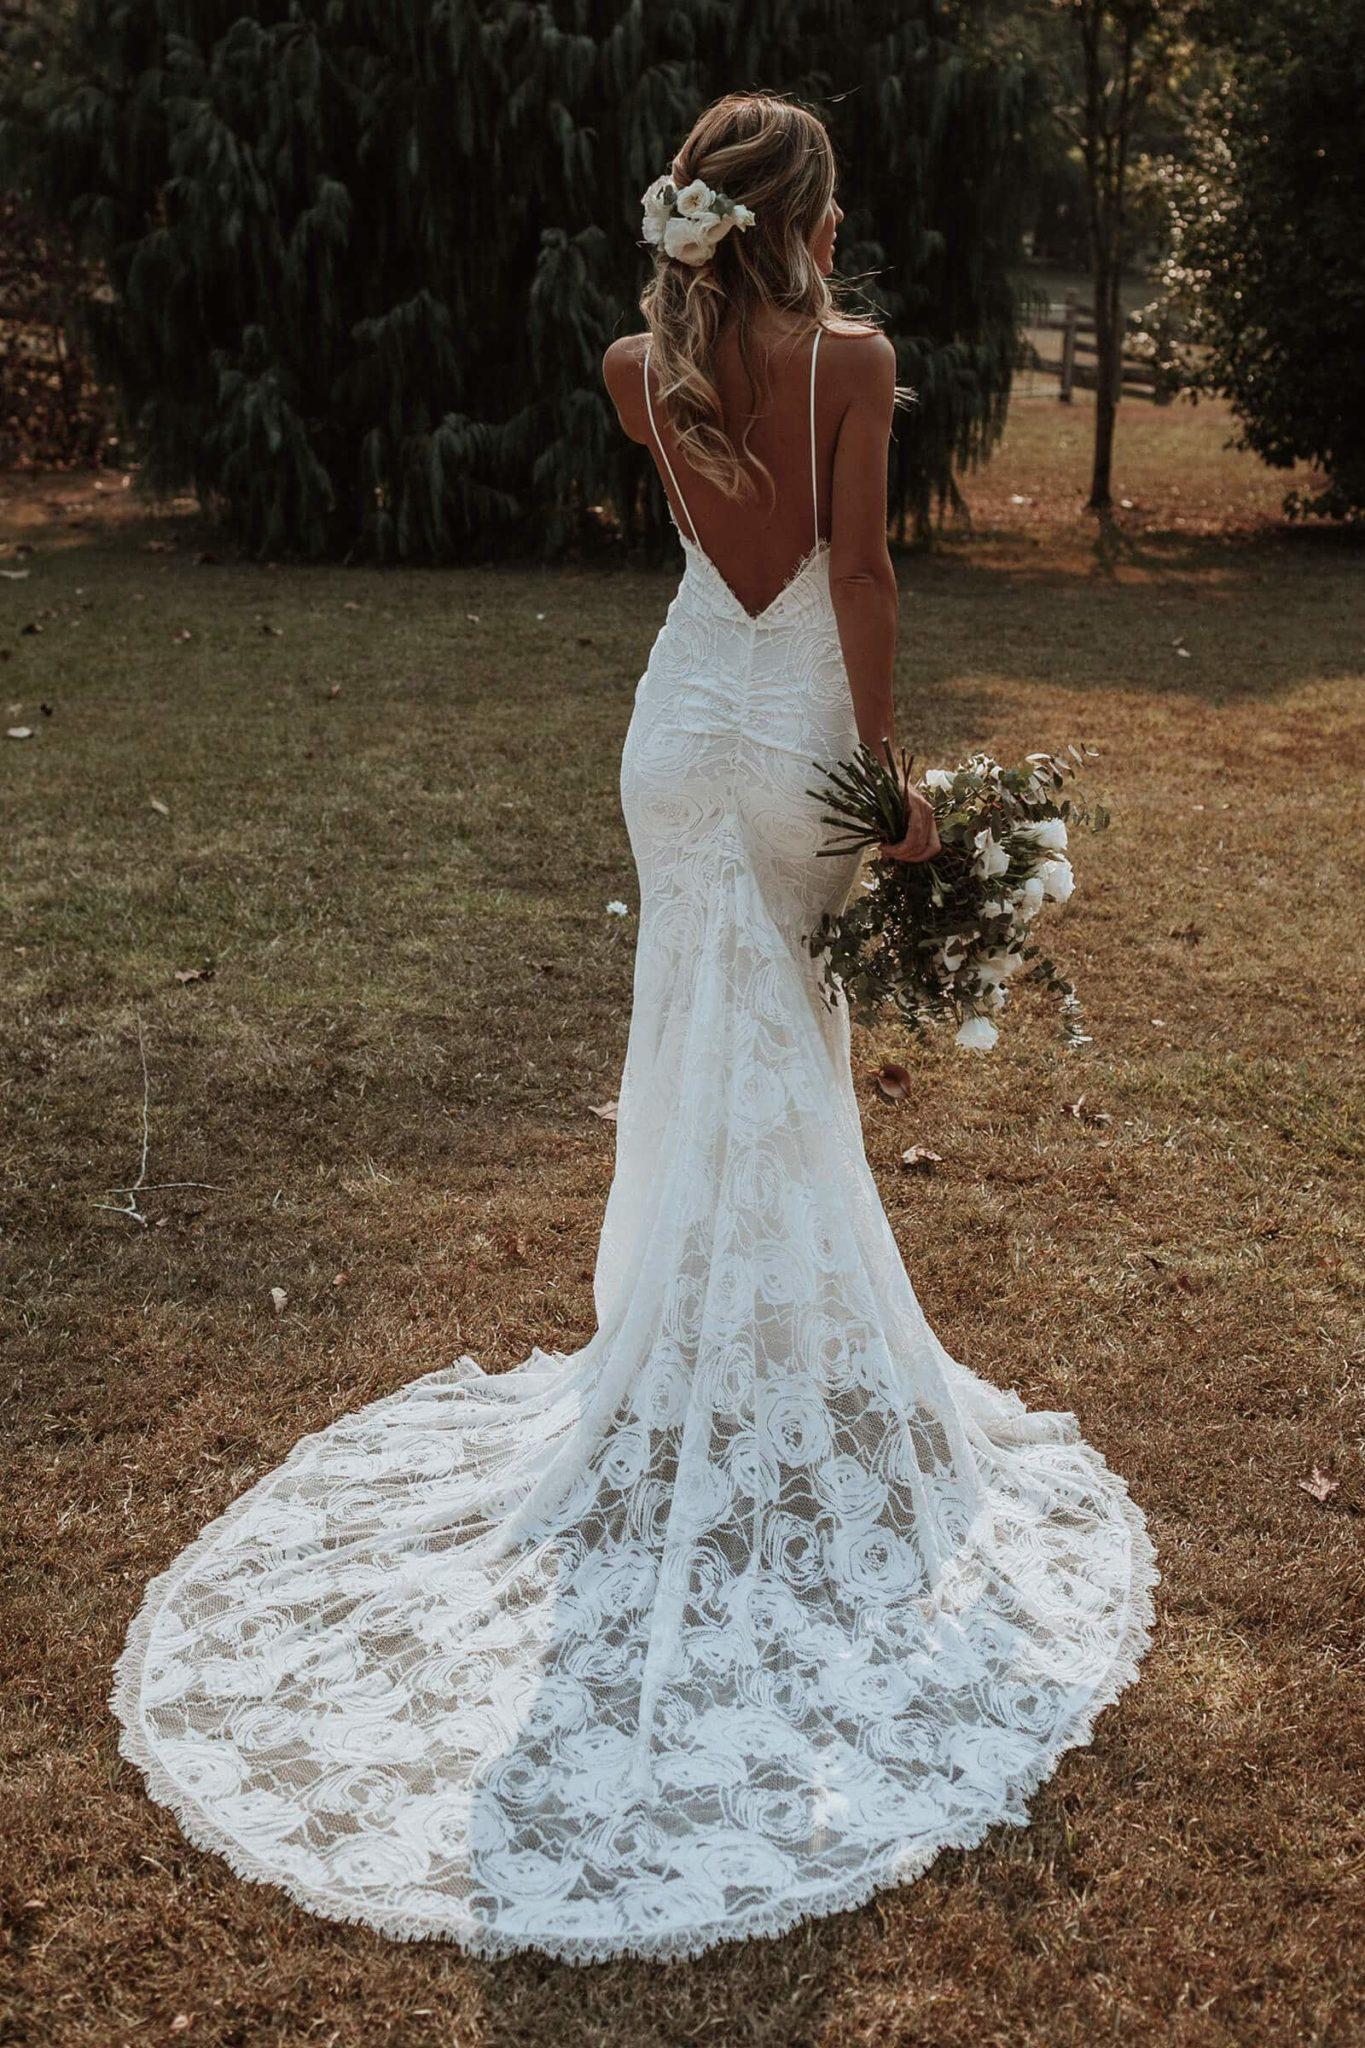 Grace loves lace clo wedding dress